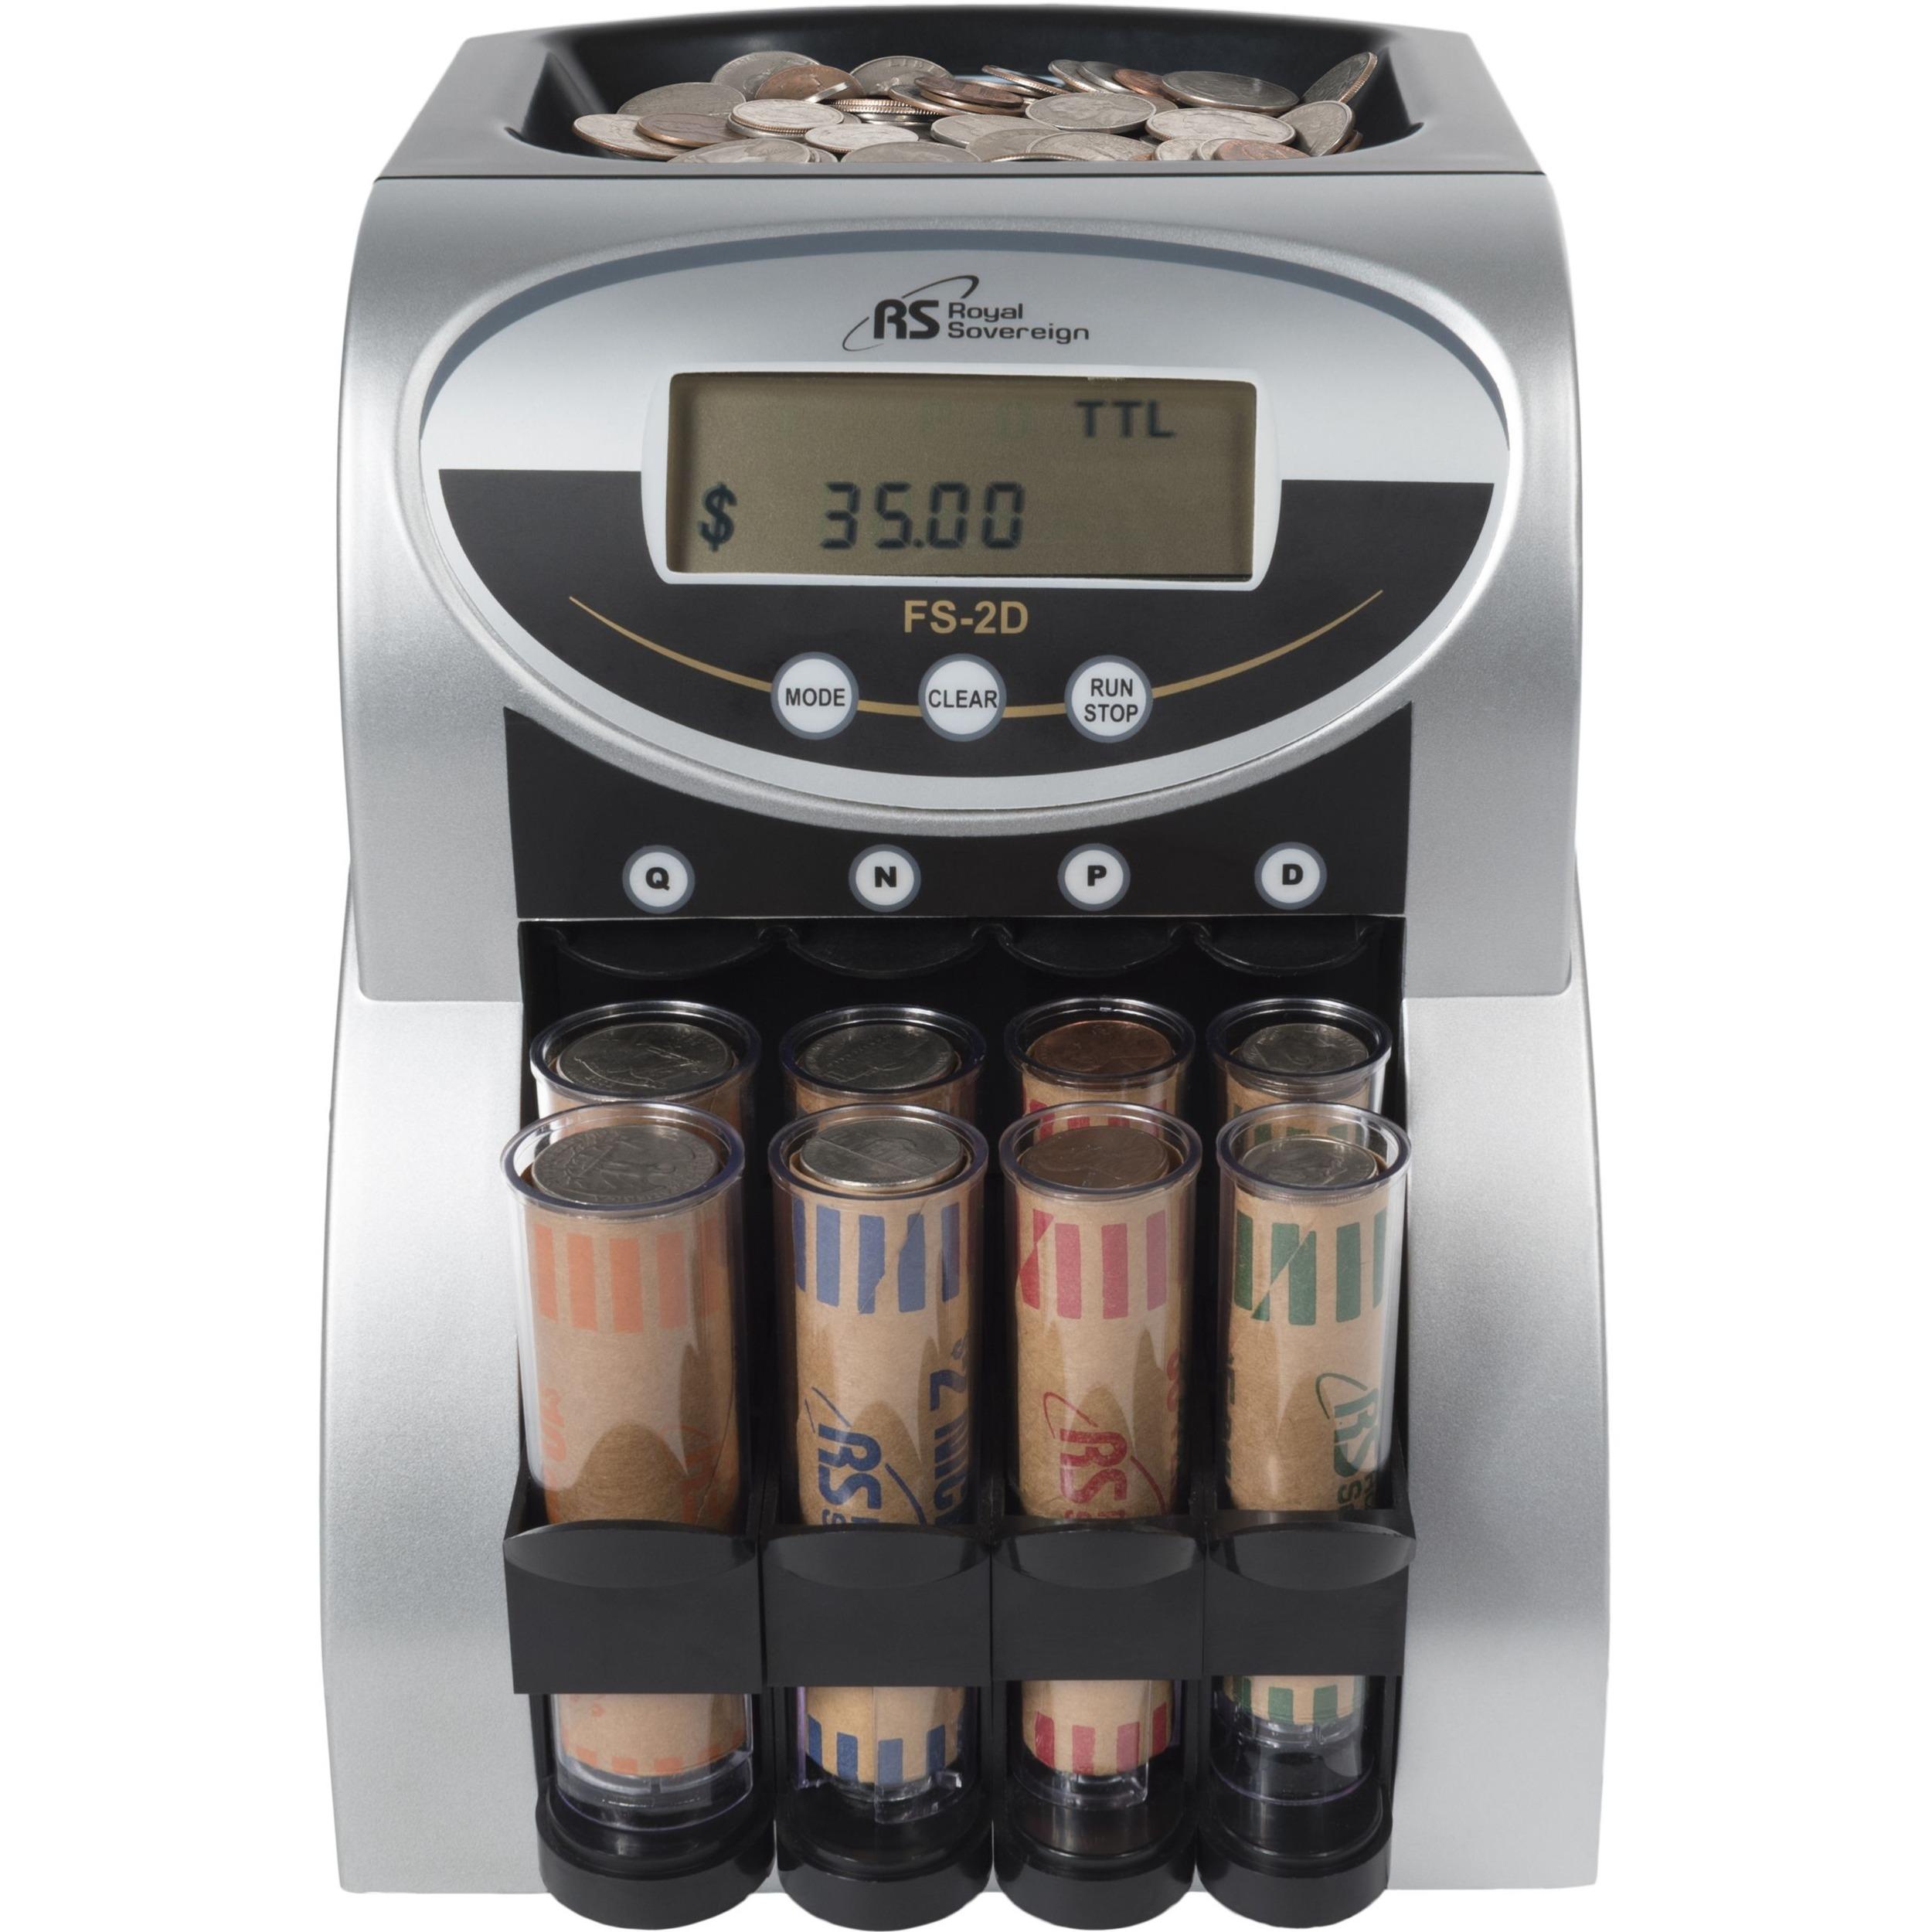 Coin Counter Machine Sorter 2 Row Electric Digital Display Anti-Jam Technology